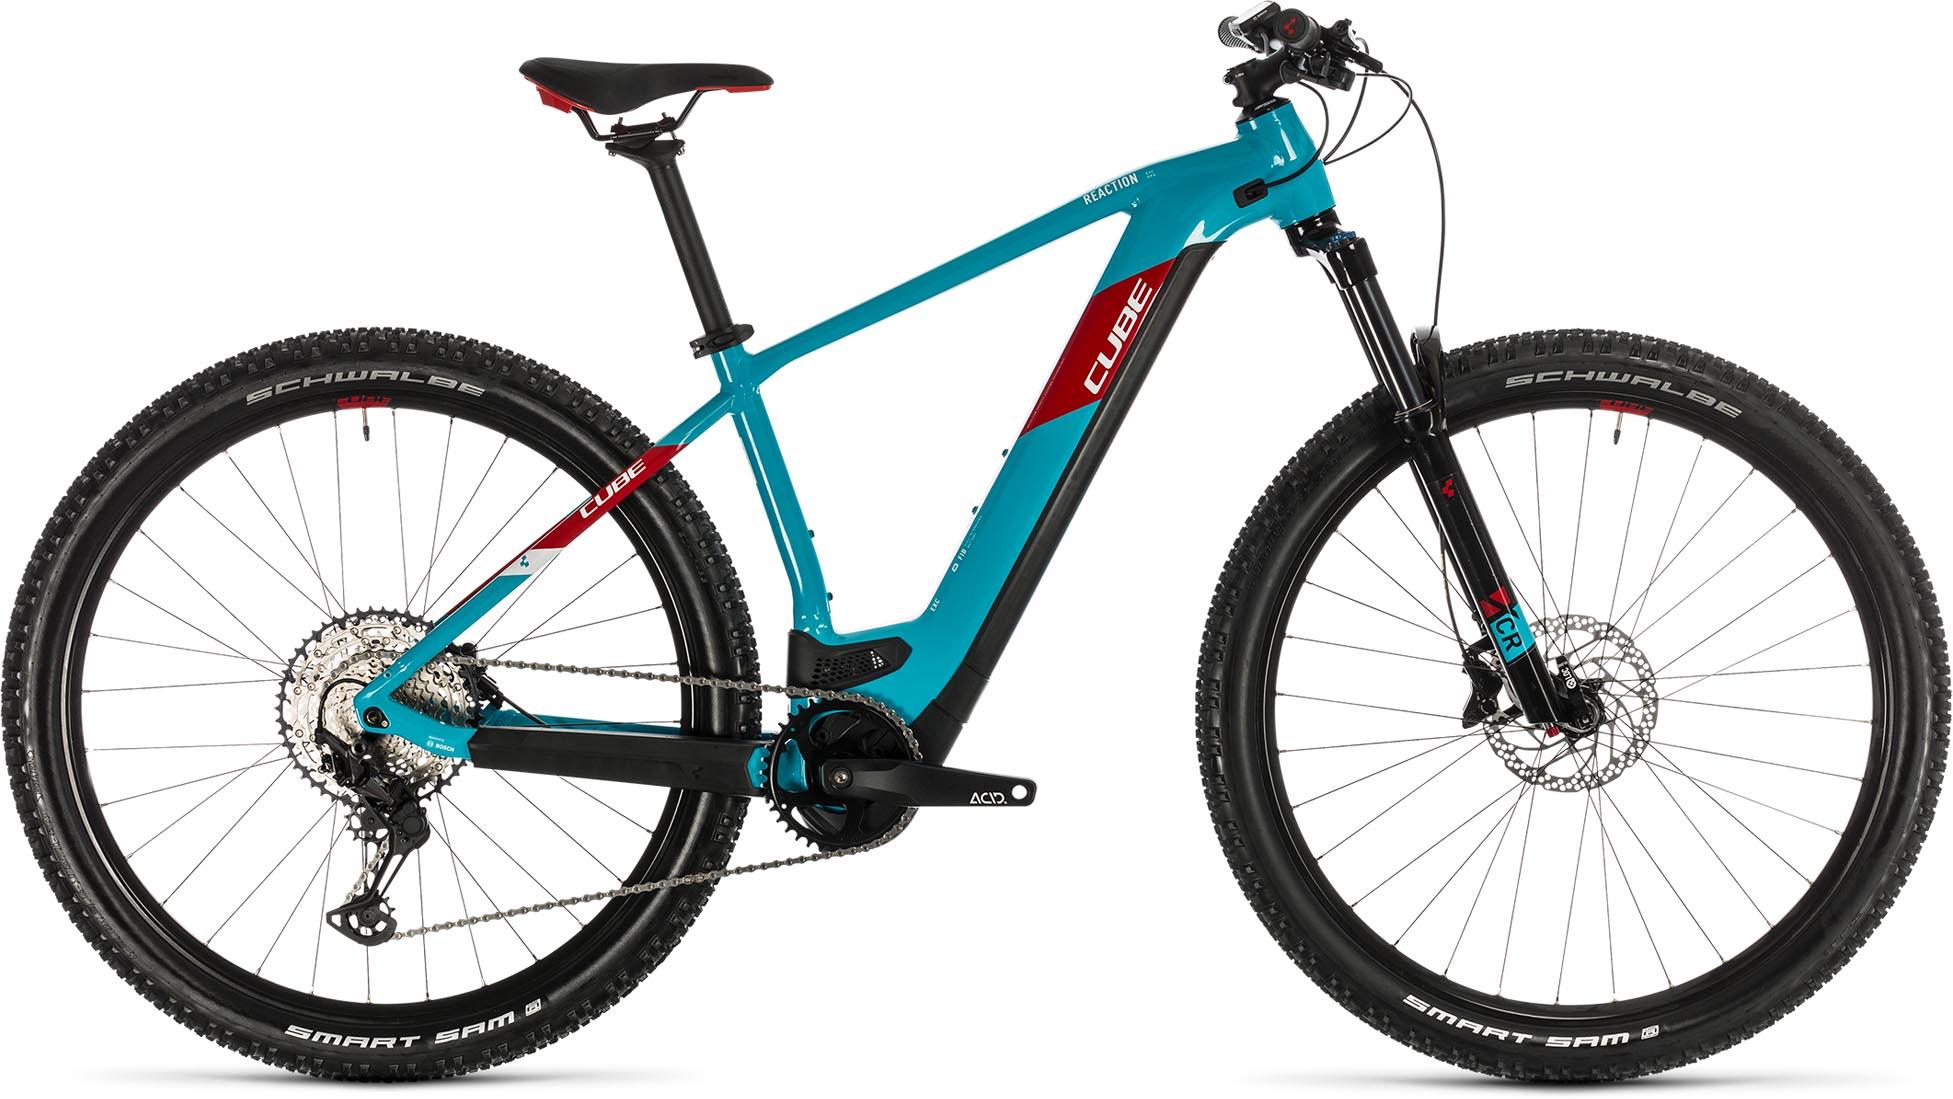 cube reaction hybrid exc 625 29 petrol n red 2020 e bike hardtail mountainbike e bike. Black Bedroom Furniture Sets. Home Design Ideas